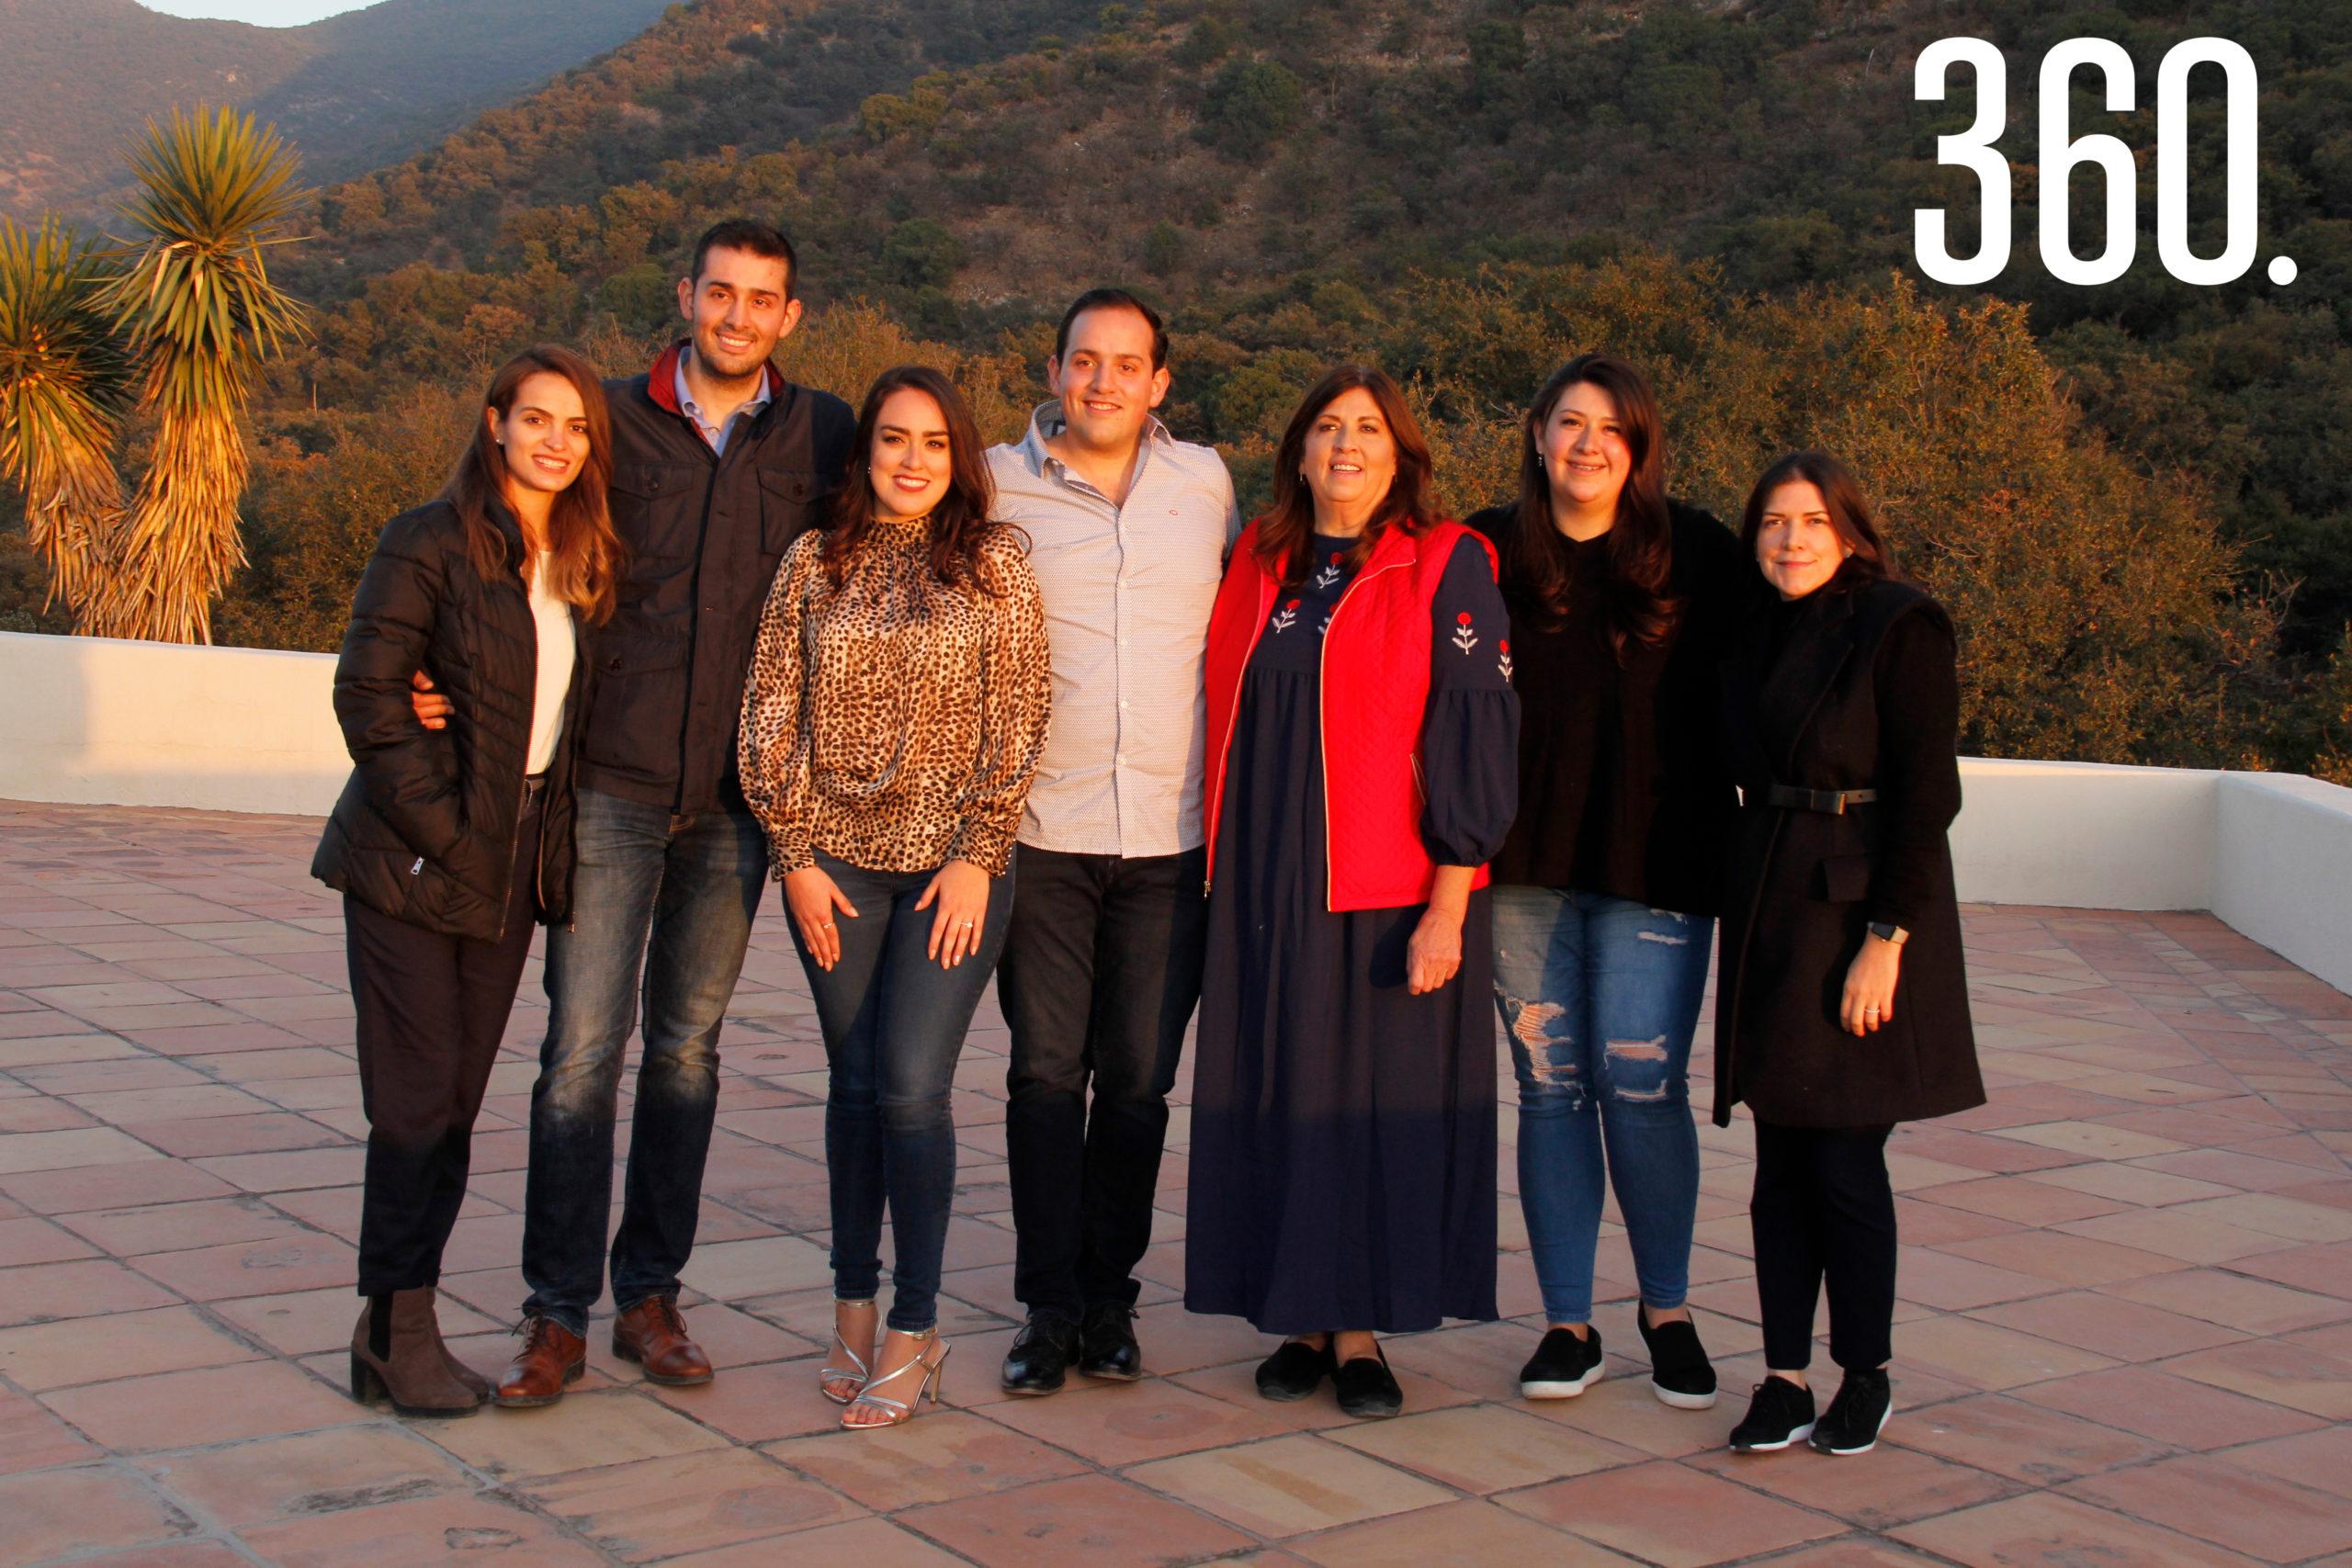 Los integrantes de la familia Villarreal Castilla acompañaron a Rodrigo e Ilsse.